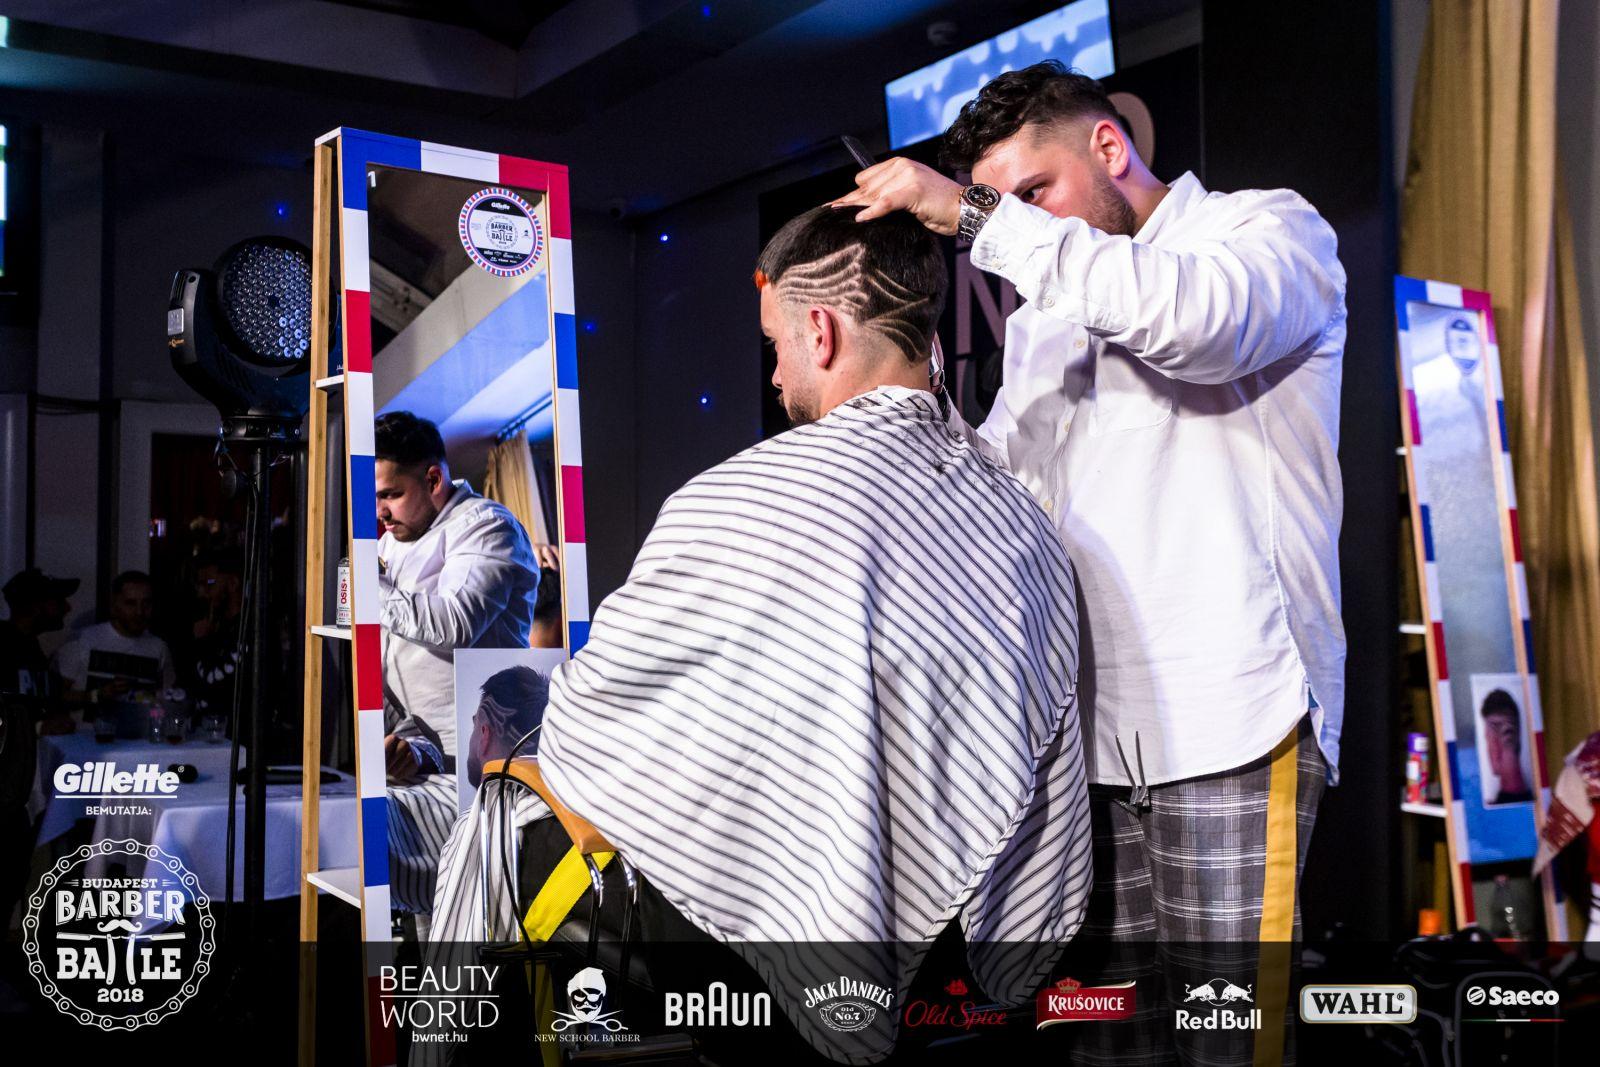 barber battle, barber battle budapest, barber battle 2018, barber budapest, barber king, beauty world net, bwnet, online időpontfoglaló program, barber shop online, barber shop budapest, borbély budapest, szakáll vágás, fodrász, fodrászverseny, barber battle budapest 2018